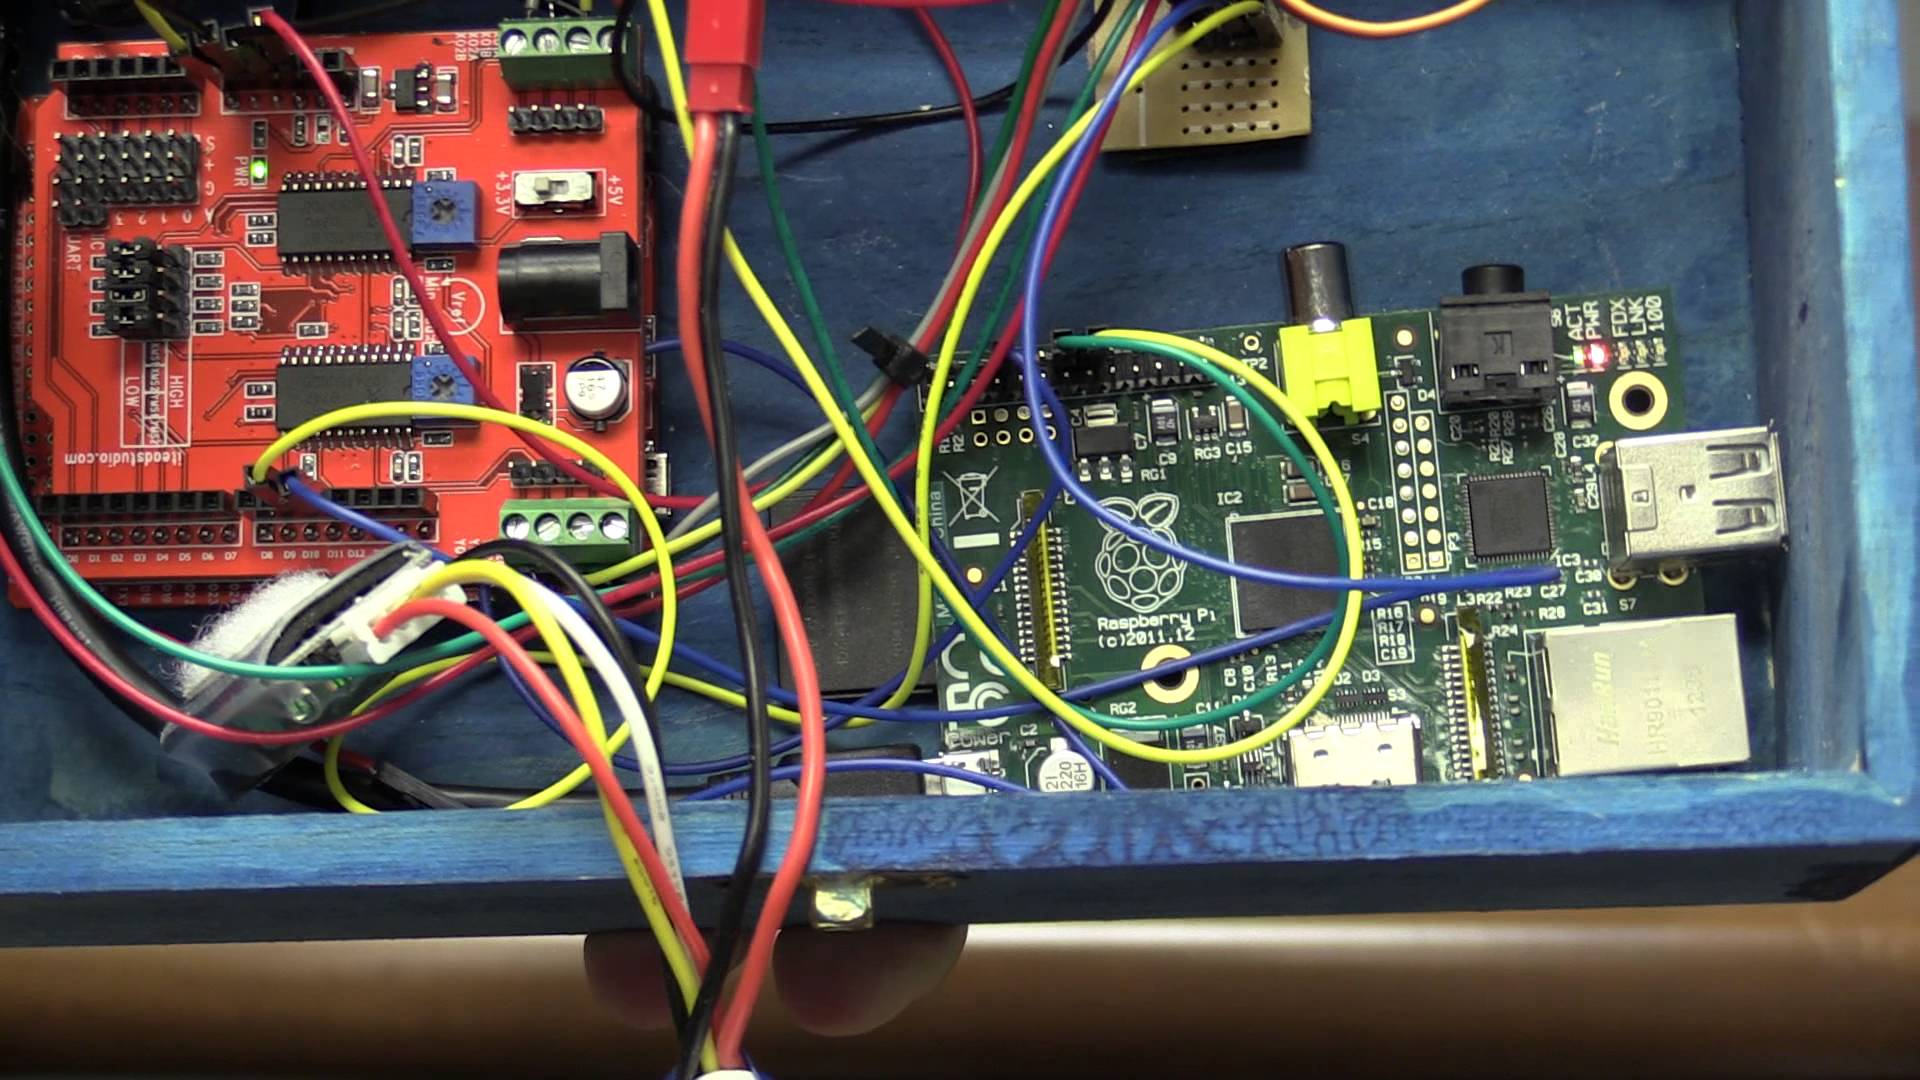 Stepper Music Box: Dual stepper motors plus two servo-driven percussion instruments, in a tidy project box #piday #raspberrypi @Raspberry_Pi « Adafruit ...